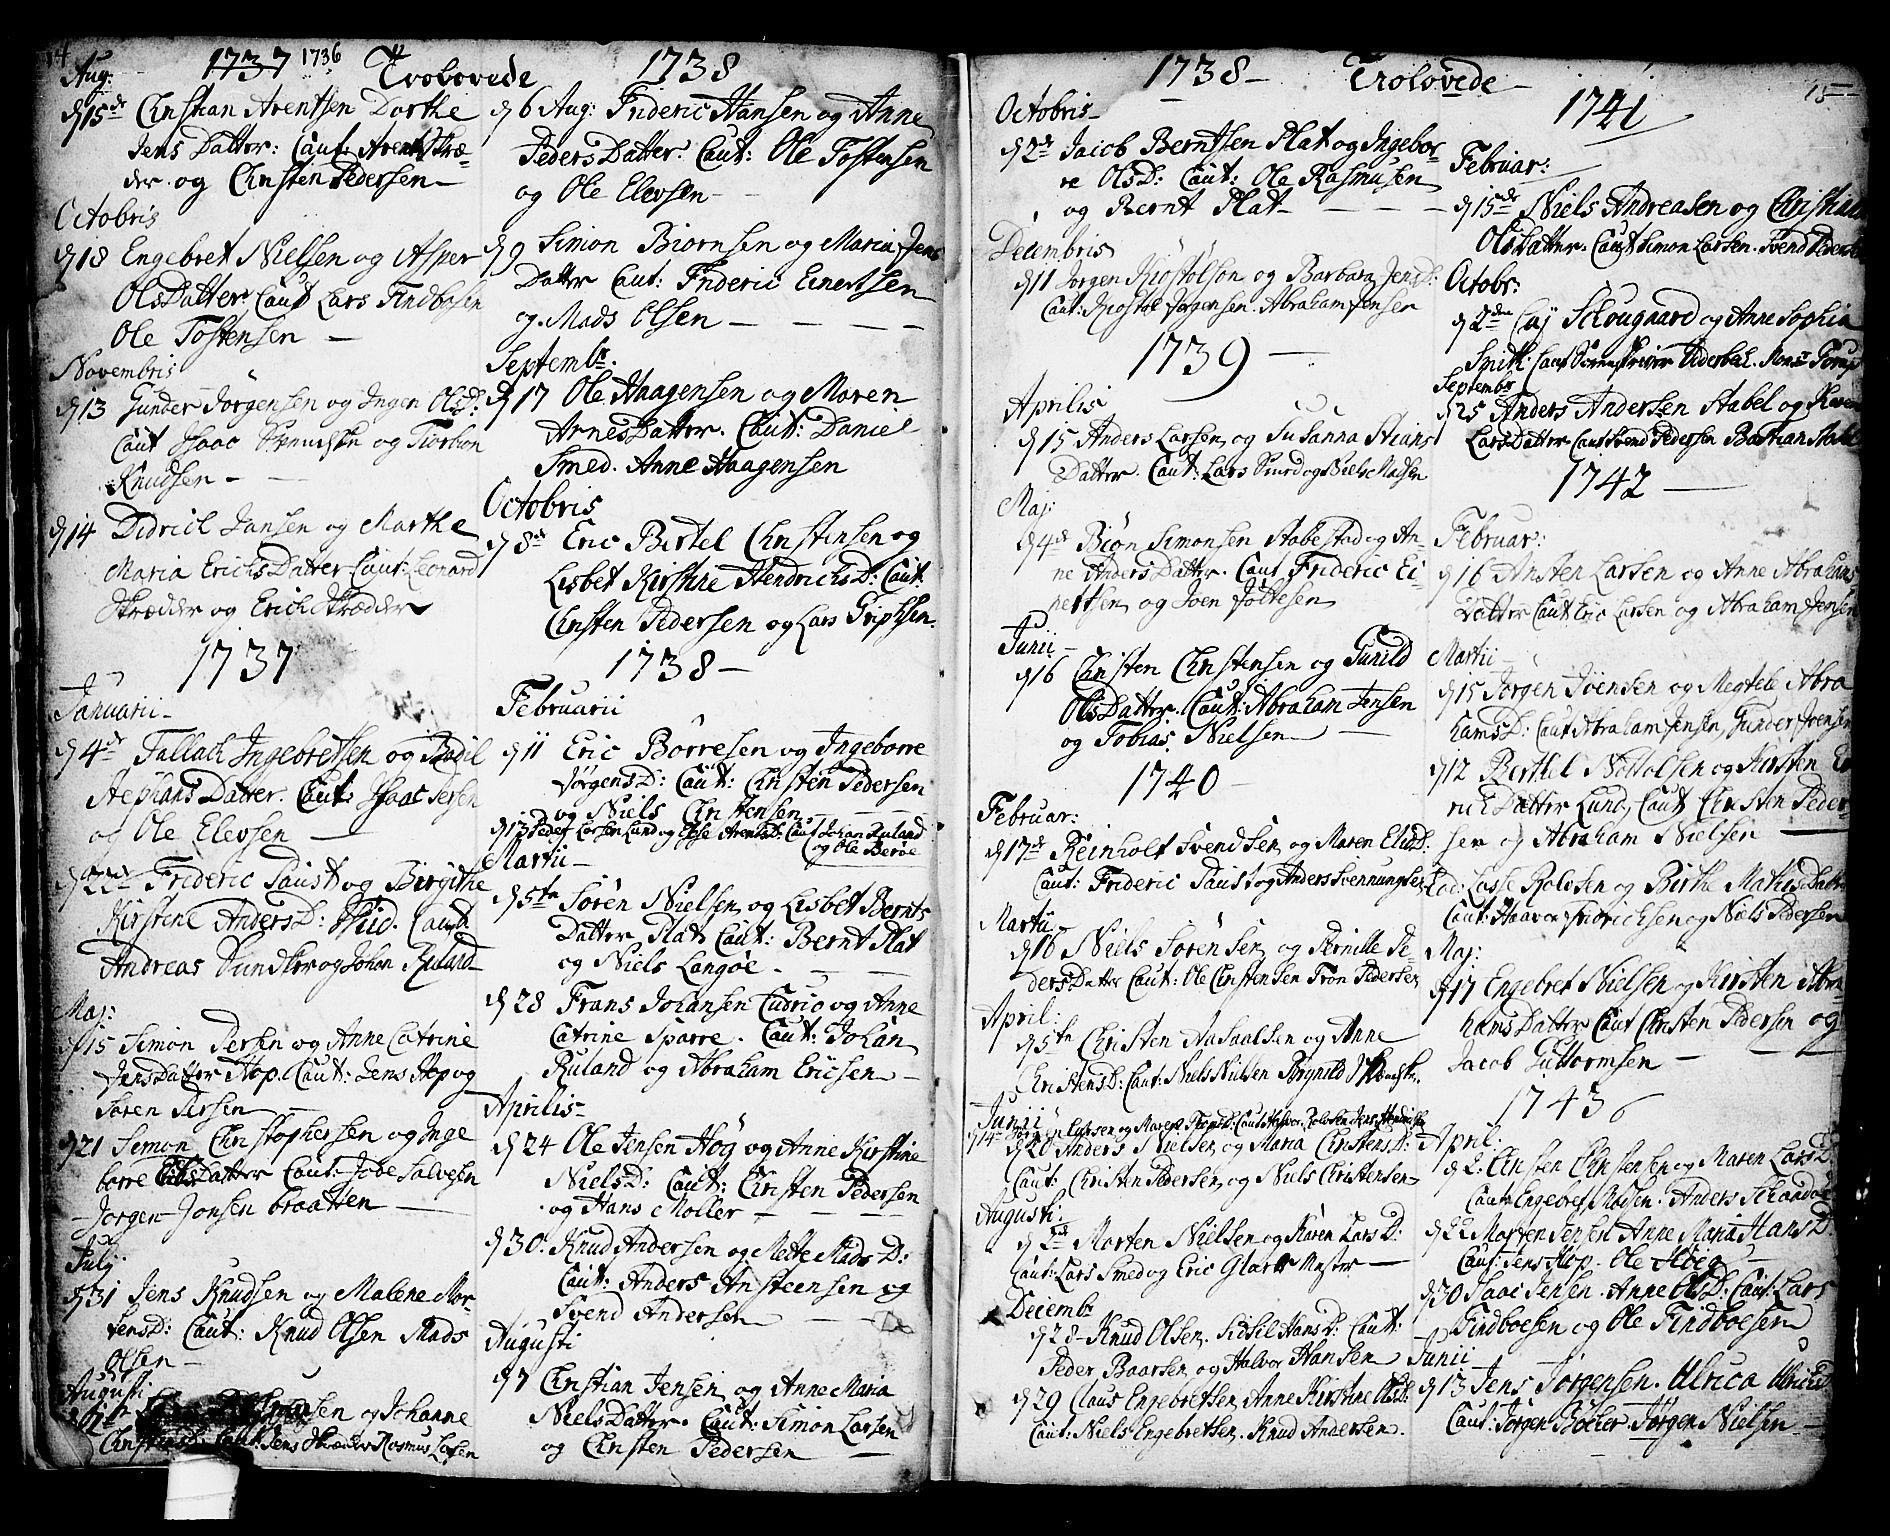 SAKO, Kragerø kirkebøker, F/Fa/L0001: Ministerialbok nr. 1, 1702-1766, s. 14-15